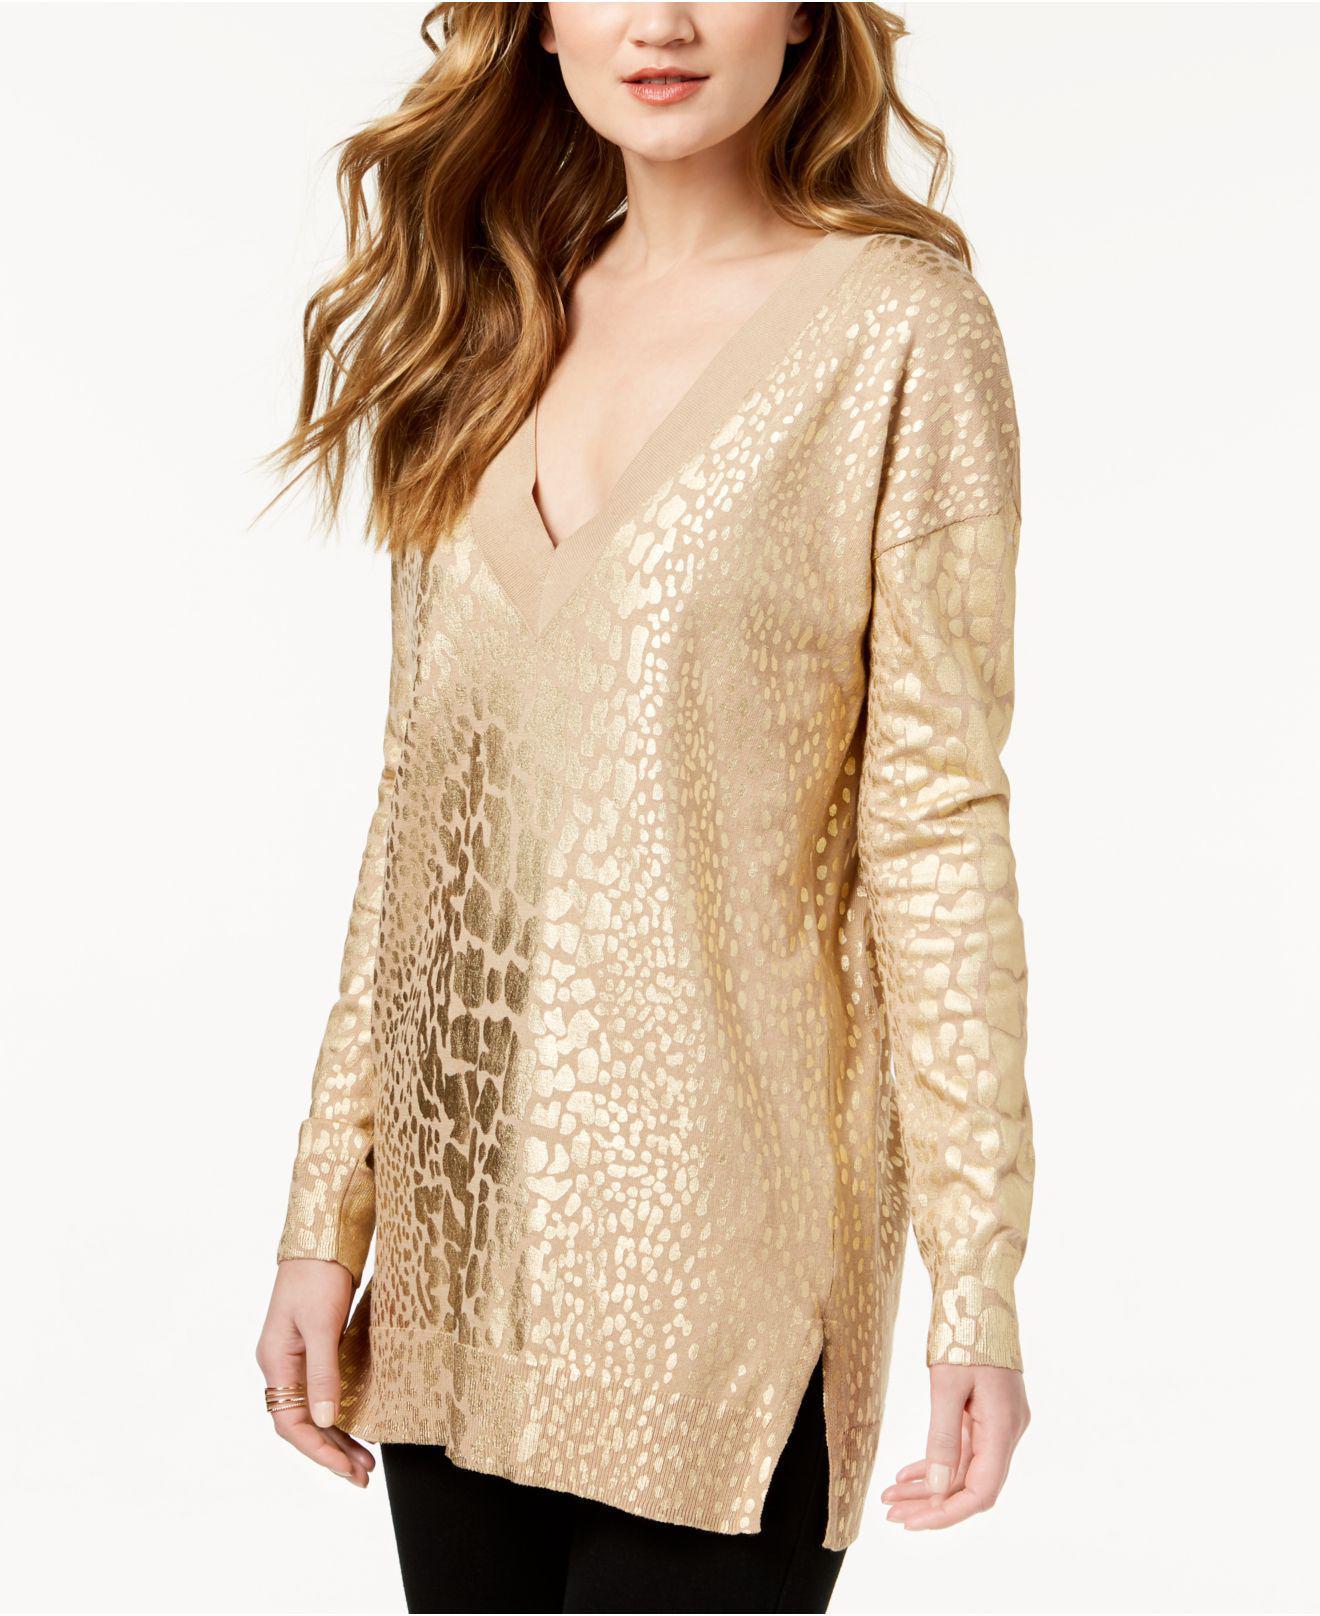 d606f536972 Lyst - Michael Kors Petite Metallic-print Tunic Sweater in Metallic ...